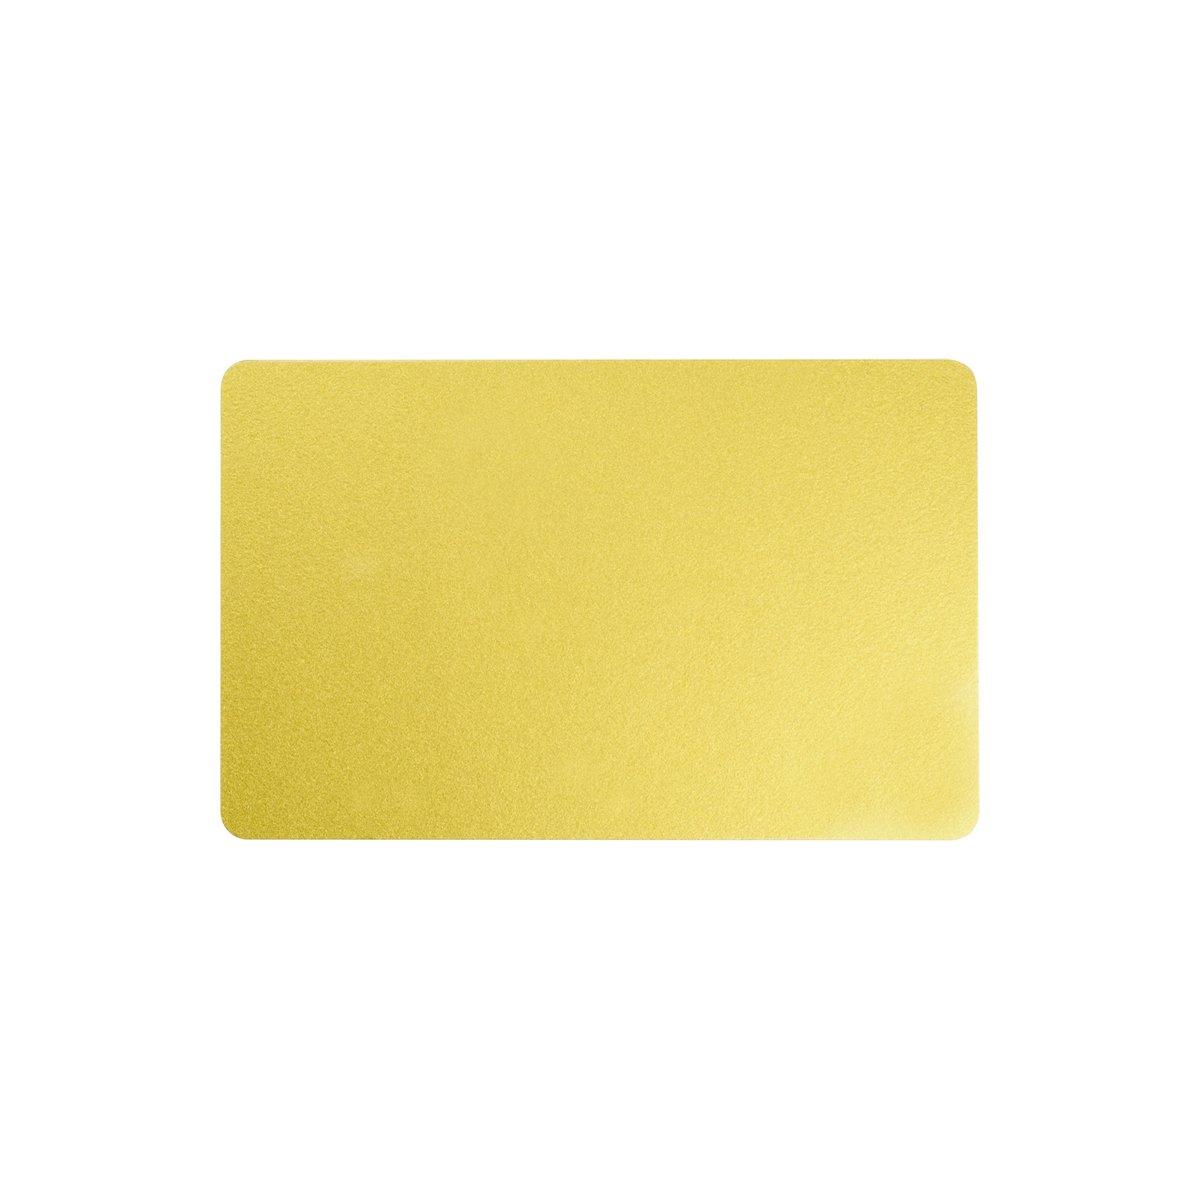 Karten, Zebra Premier Colour PVC, gold metallic, 30 mil